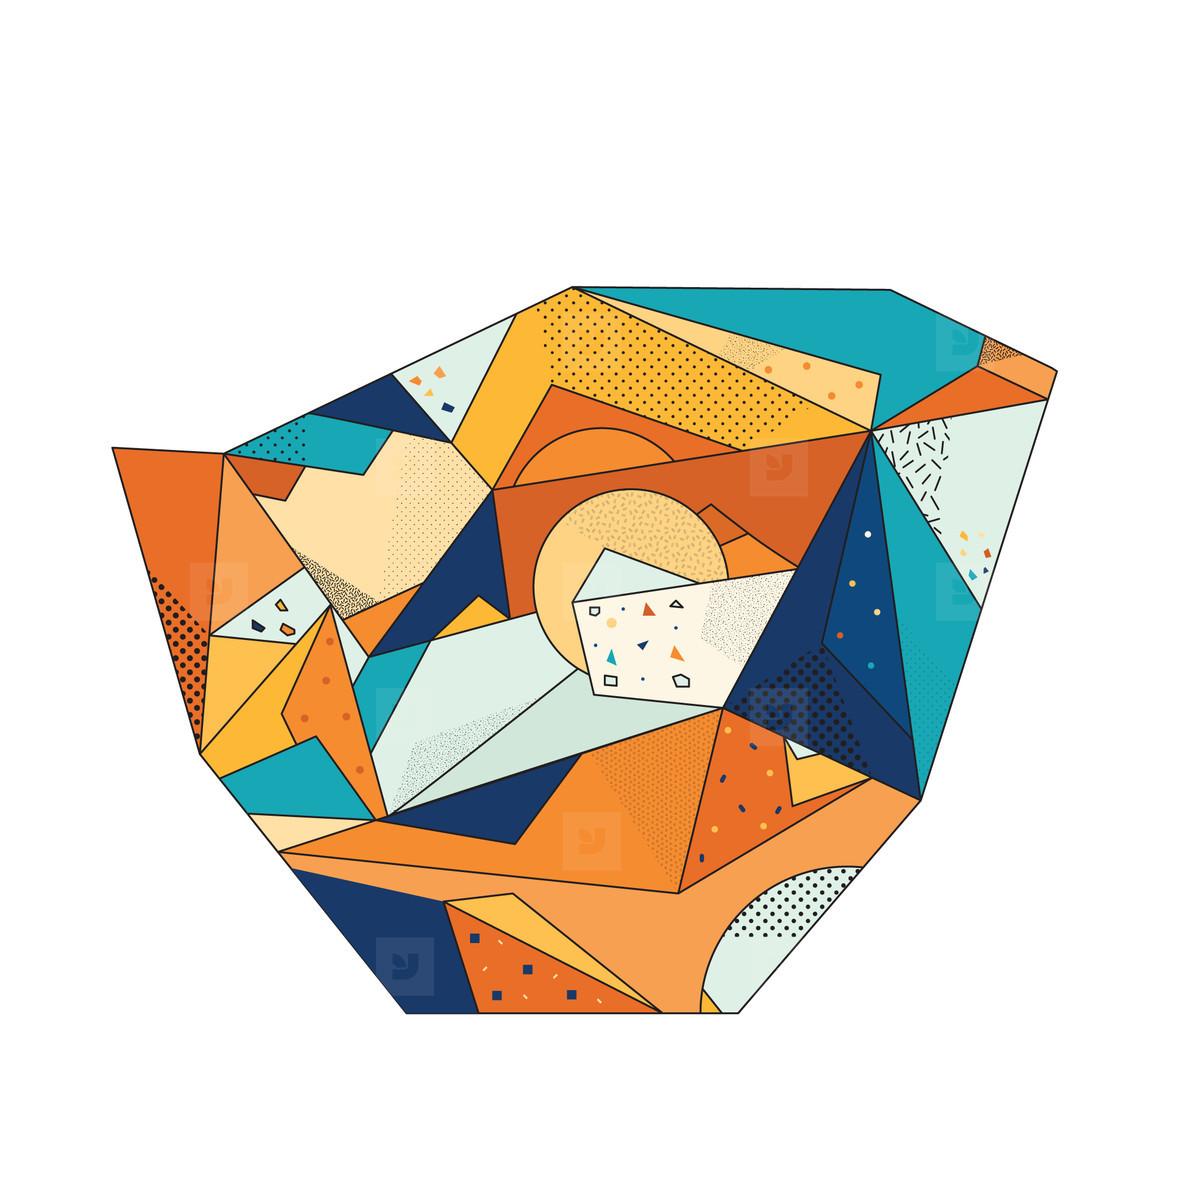 Colored Geometric Crystal 06